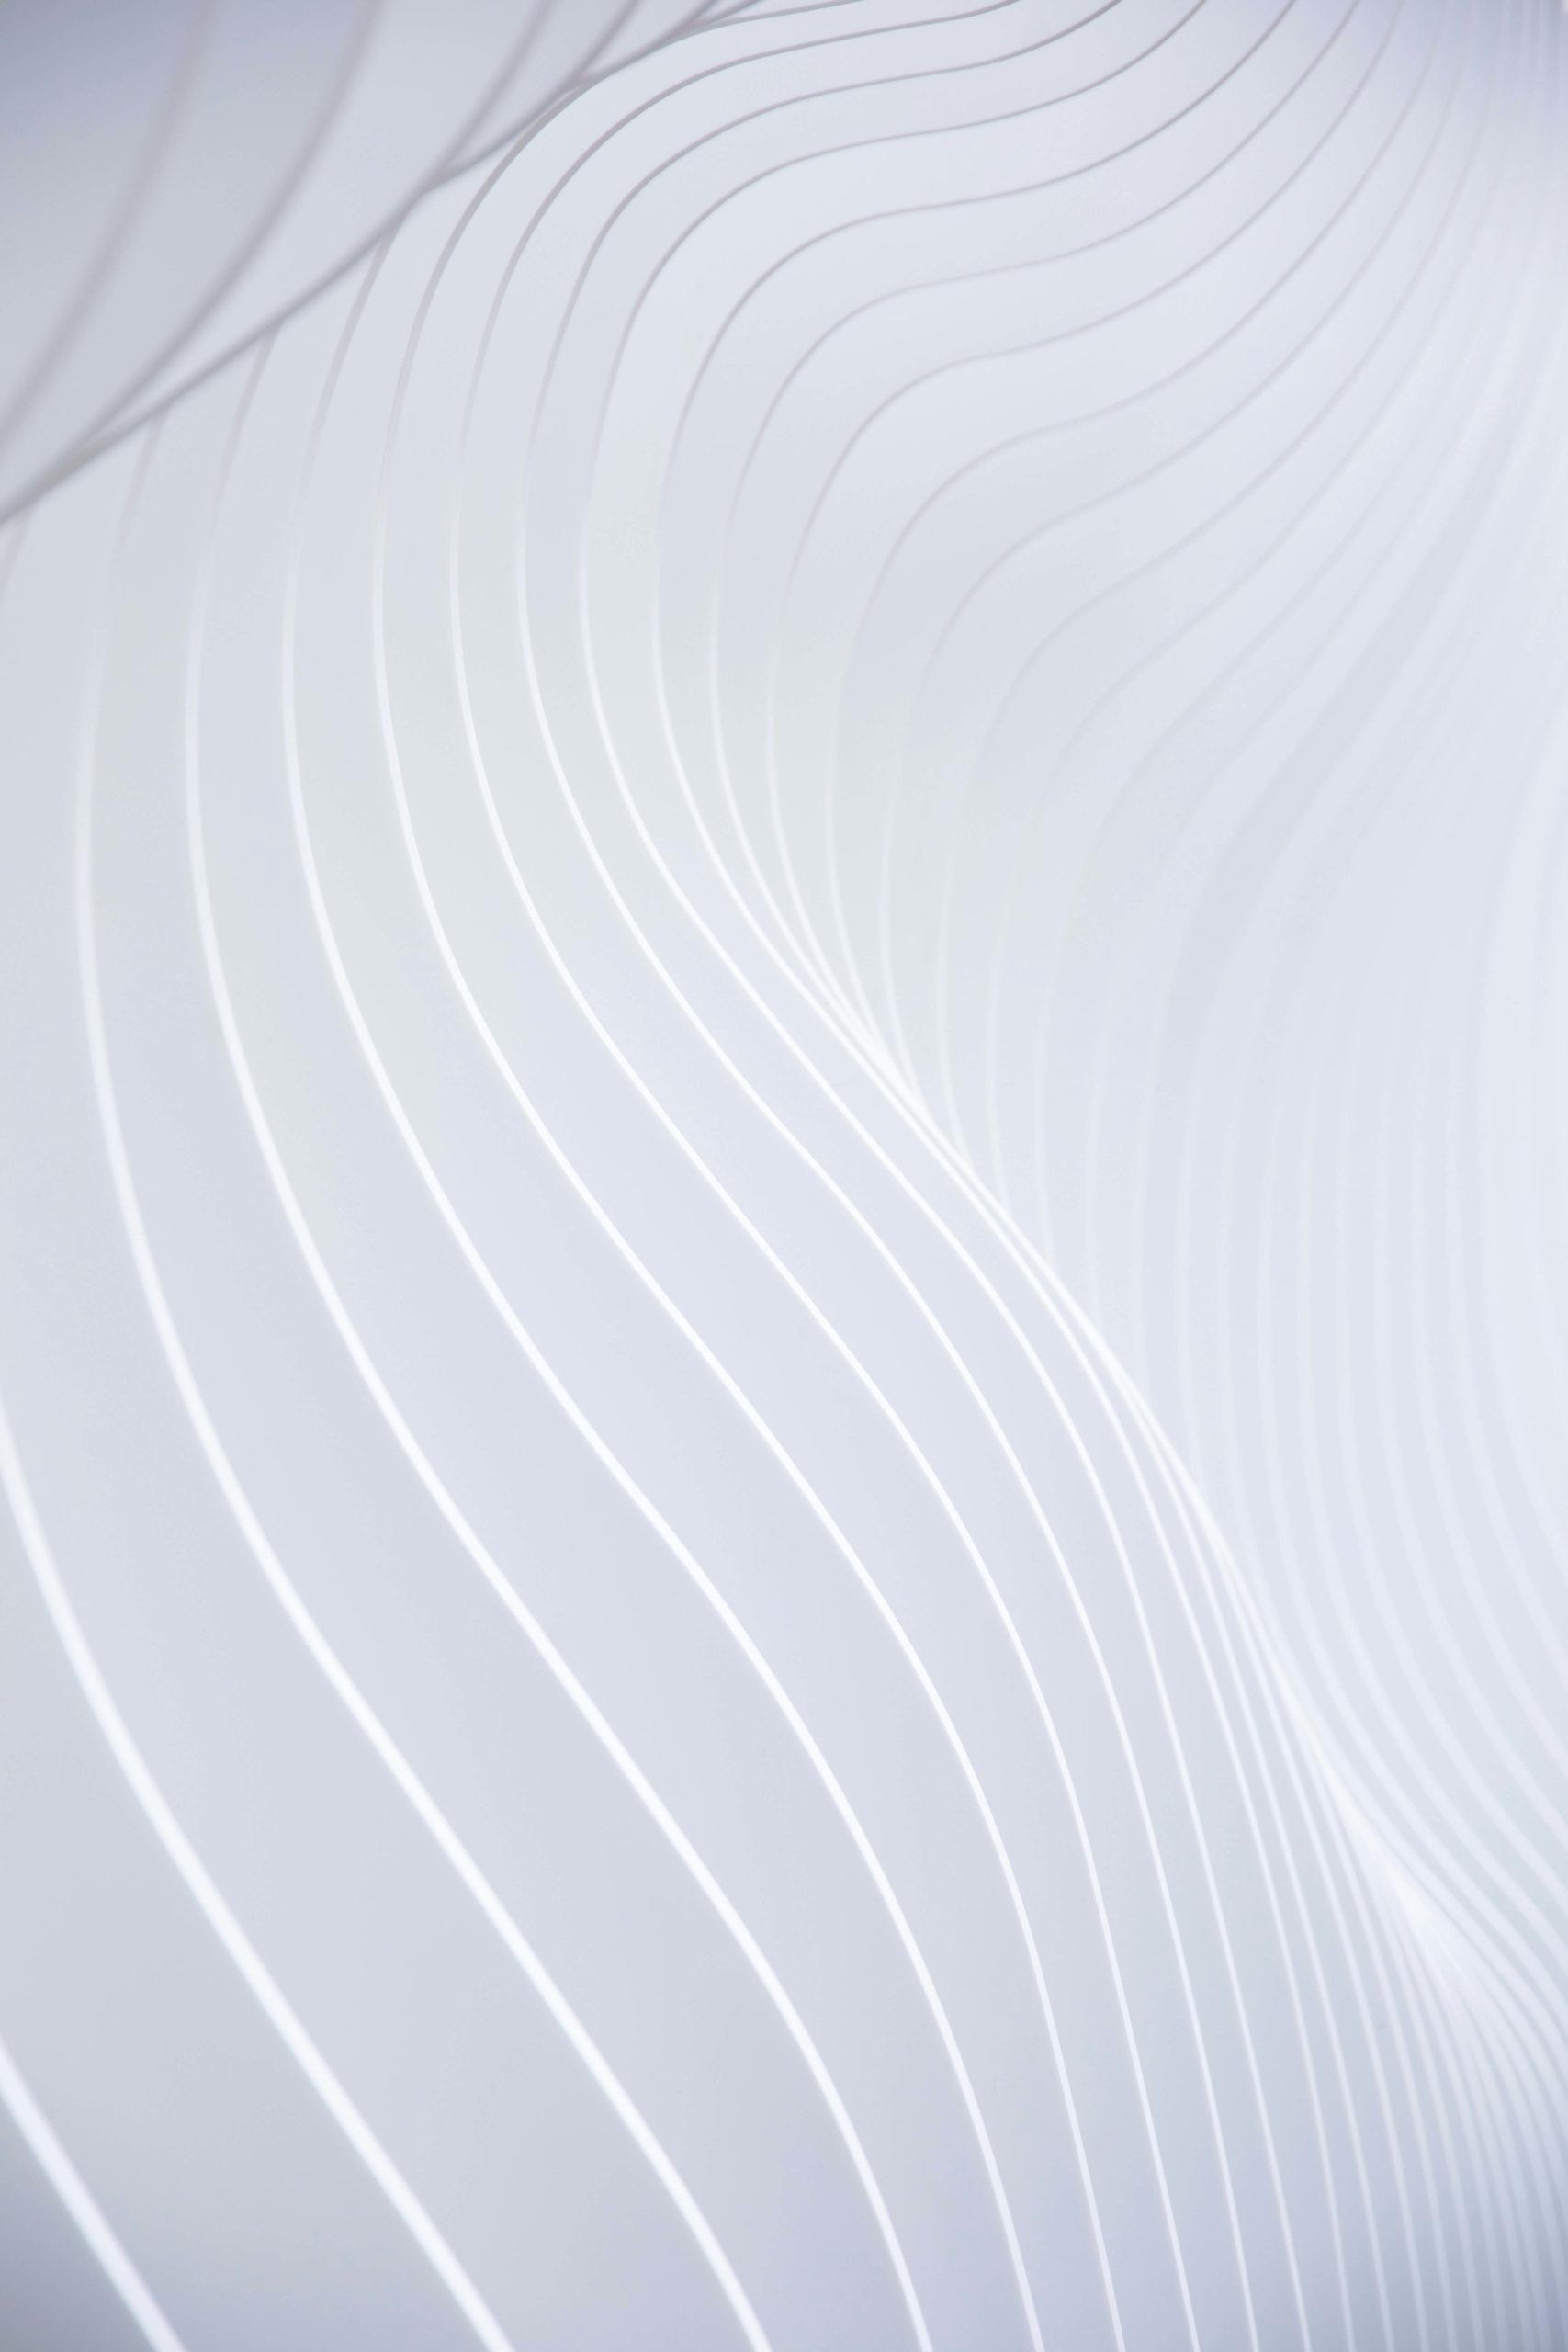 web-design-agency-blog-art